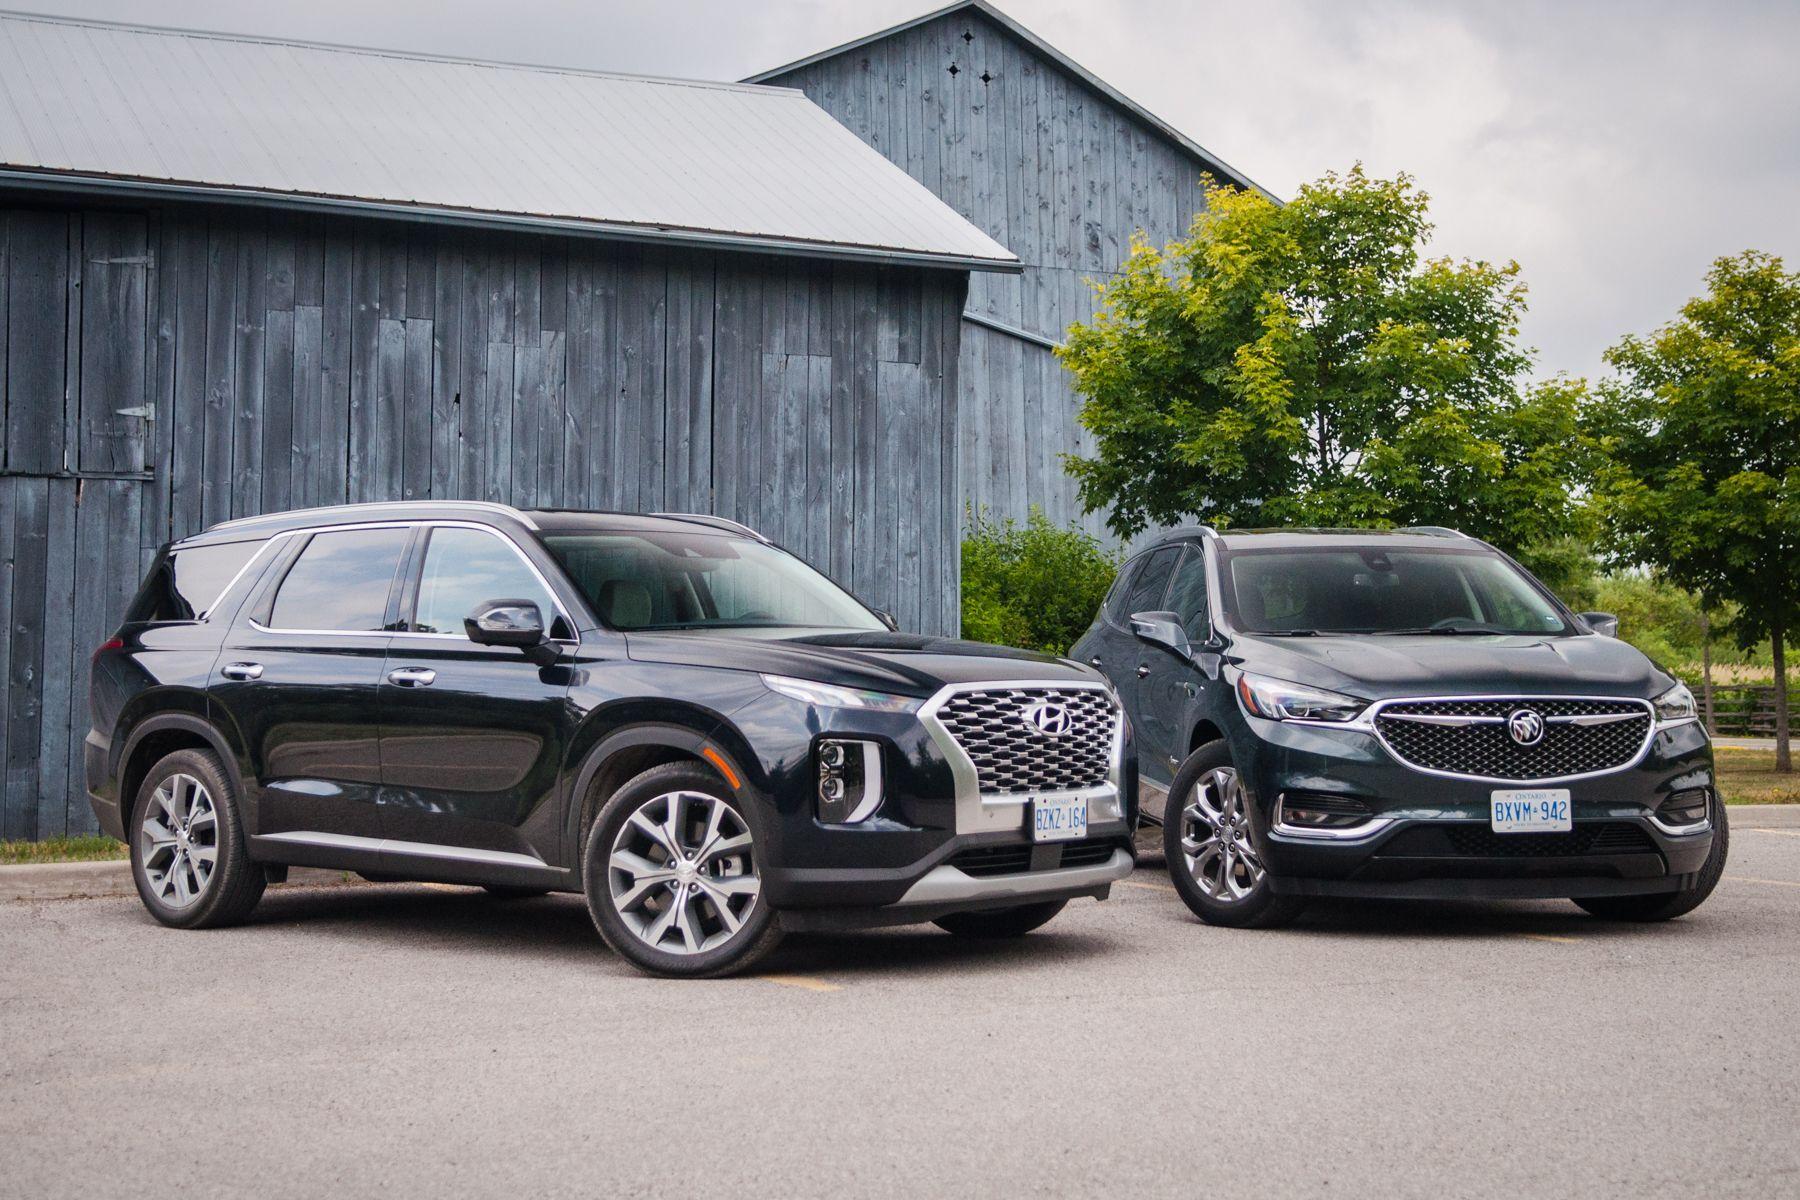 Suv Comparison 2020 Hyundai Palisade Vs 2019 Buick Enclave Suv Comparison Buick Enclave Buick